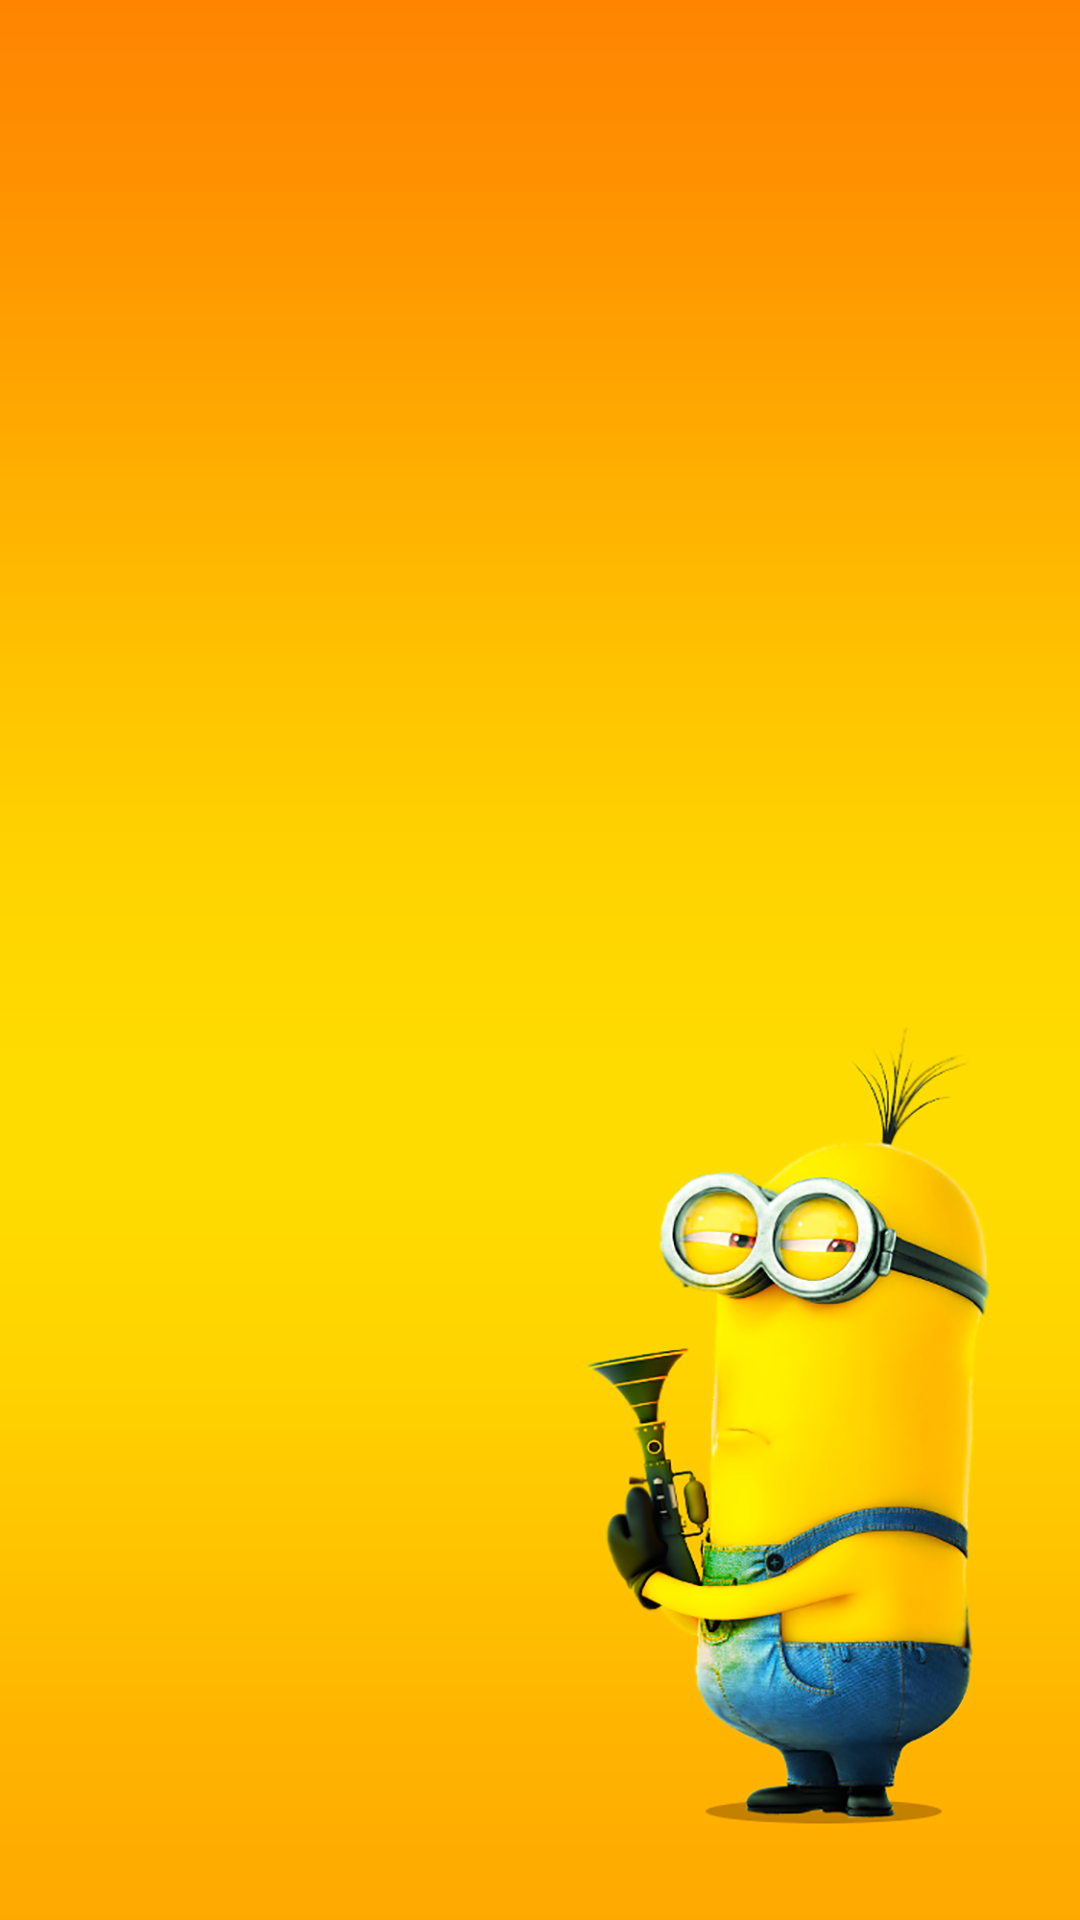 Wallpaper iphone banana - Art Creative Minions Bananas Funny Cartoon Yellow